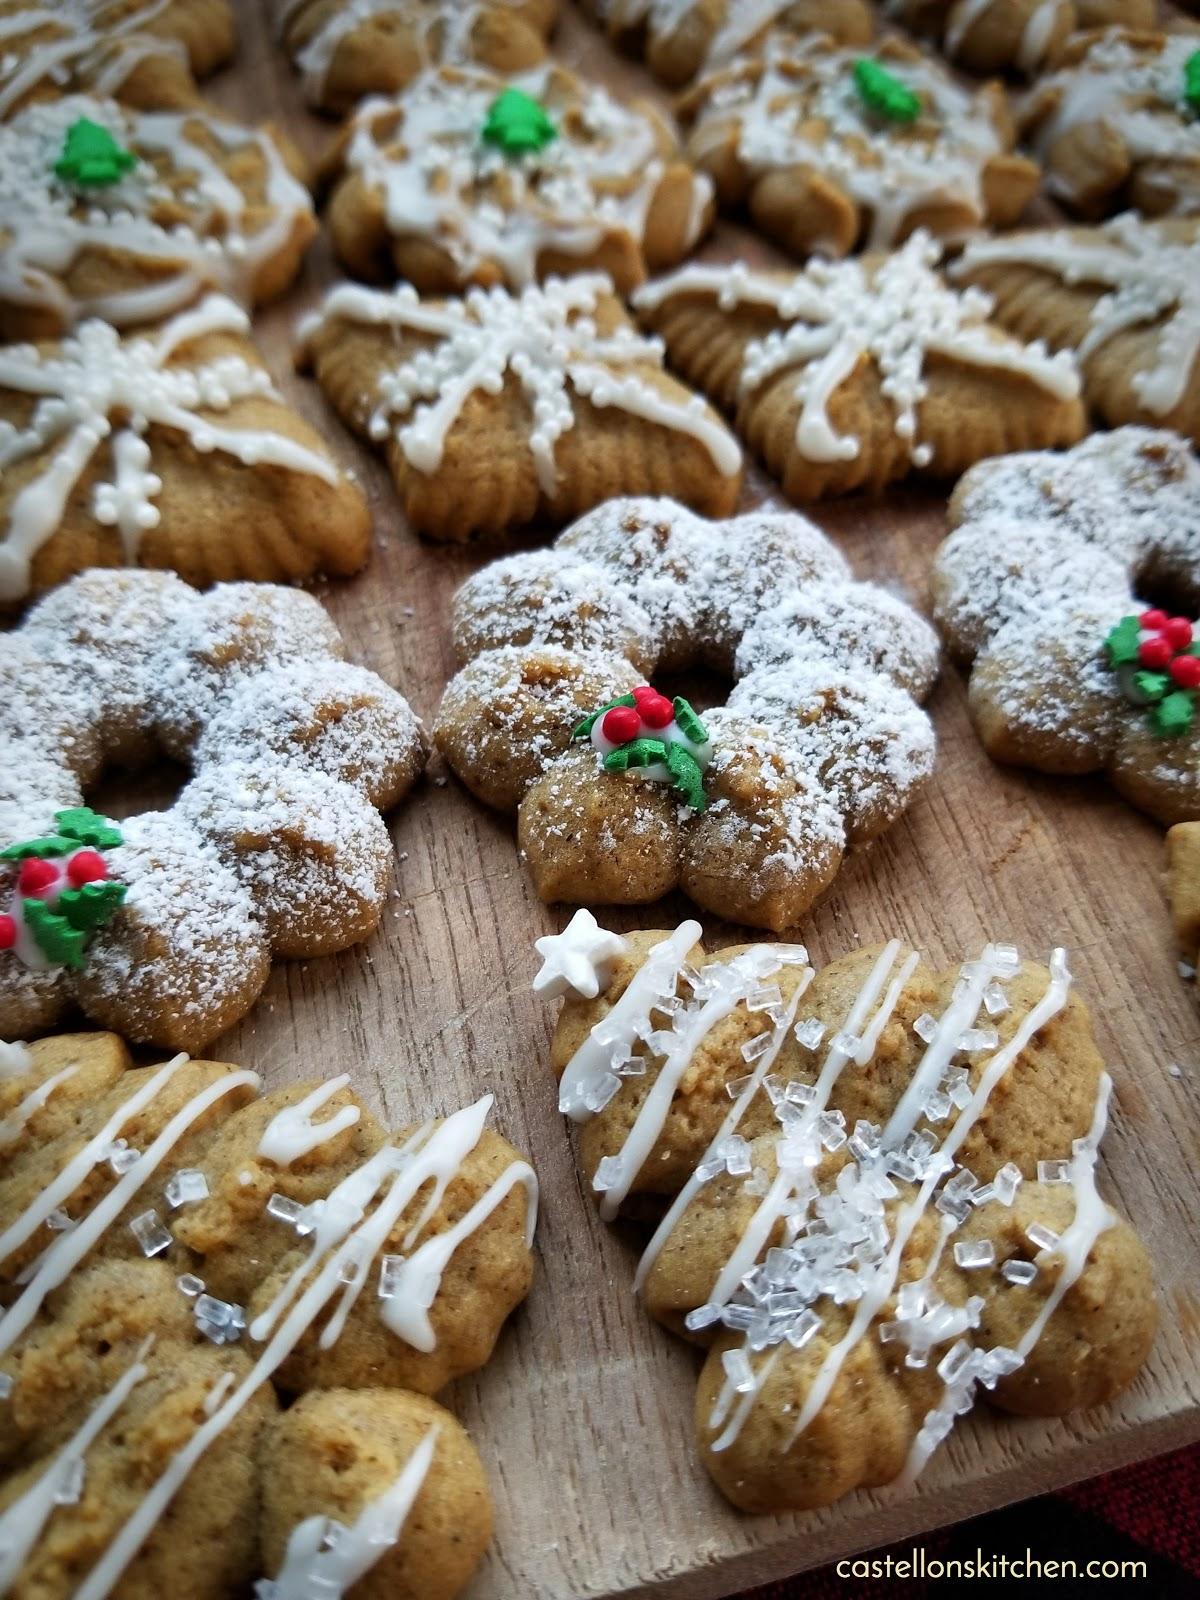 Castellon S Kitchen Gingerbread Spritz Cookies